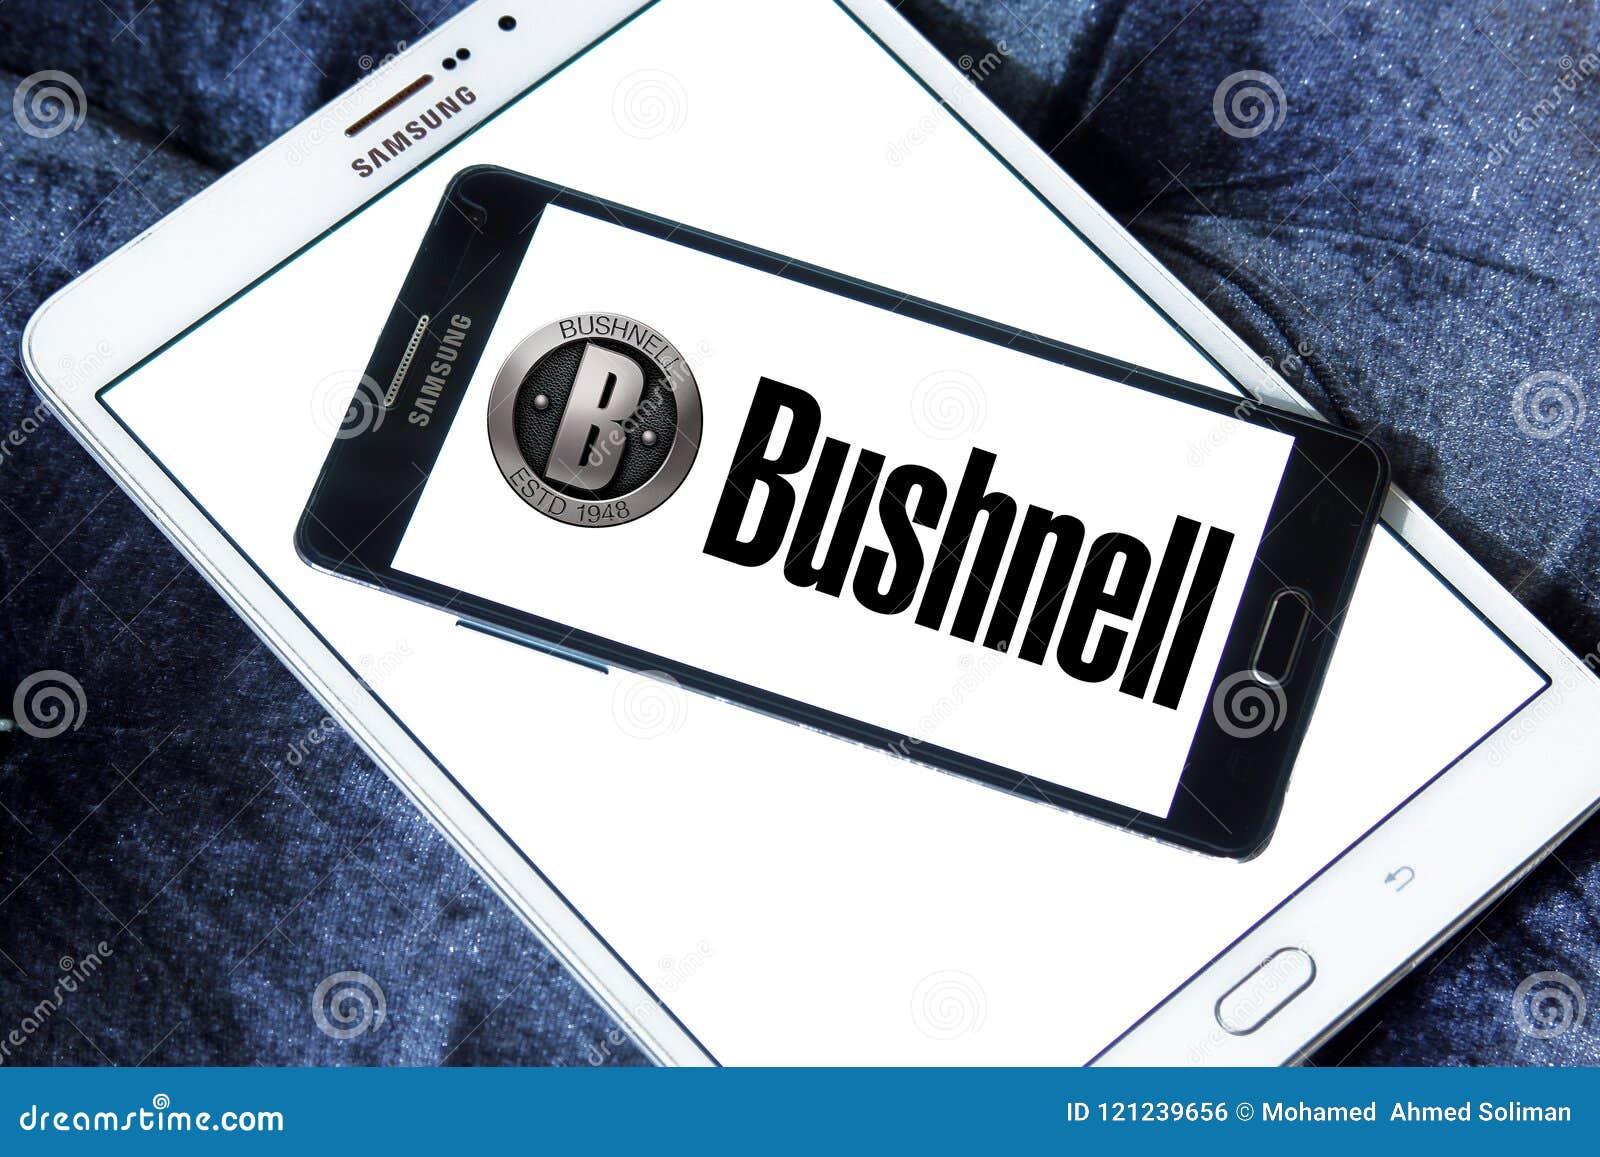 Bushnell Korporation logo